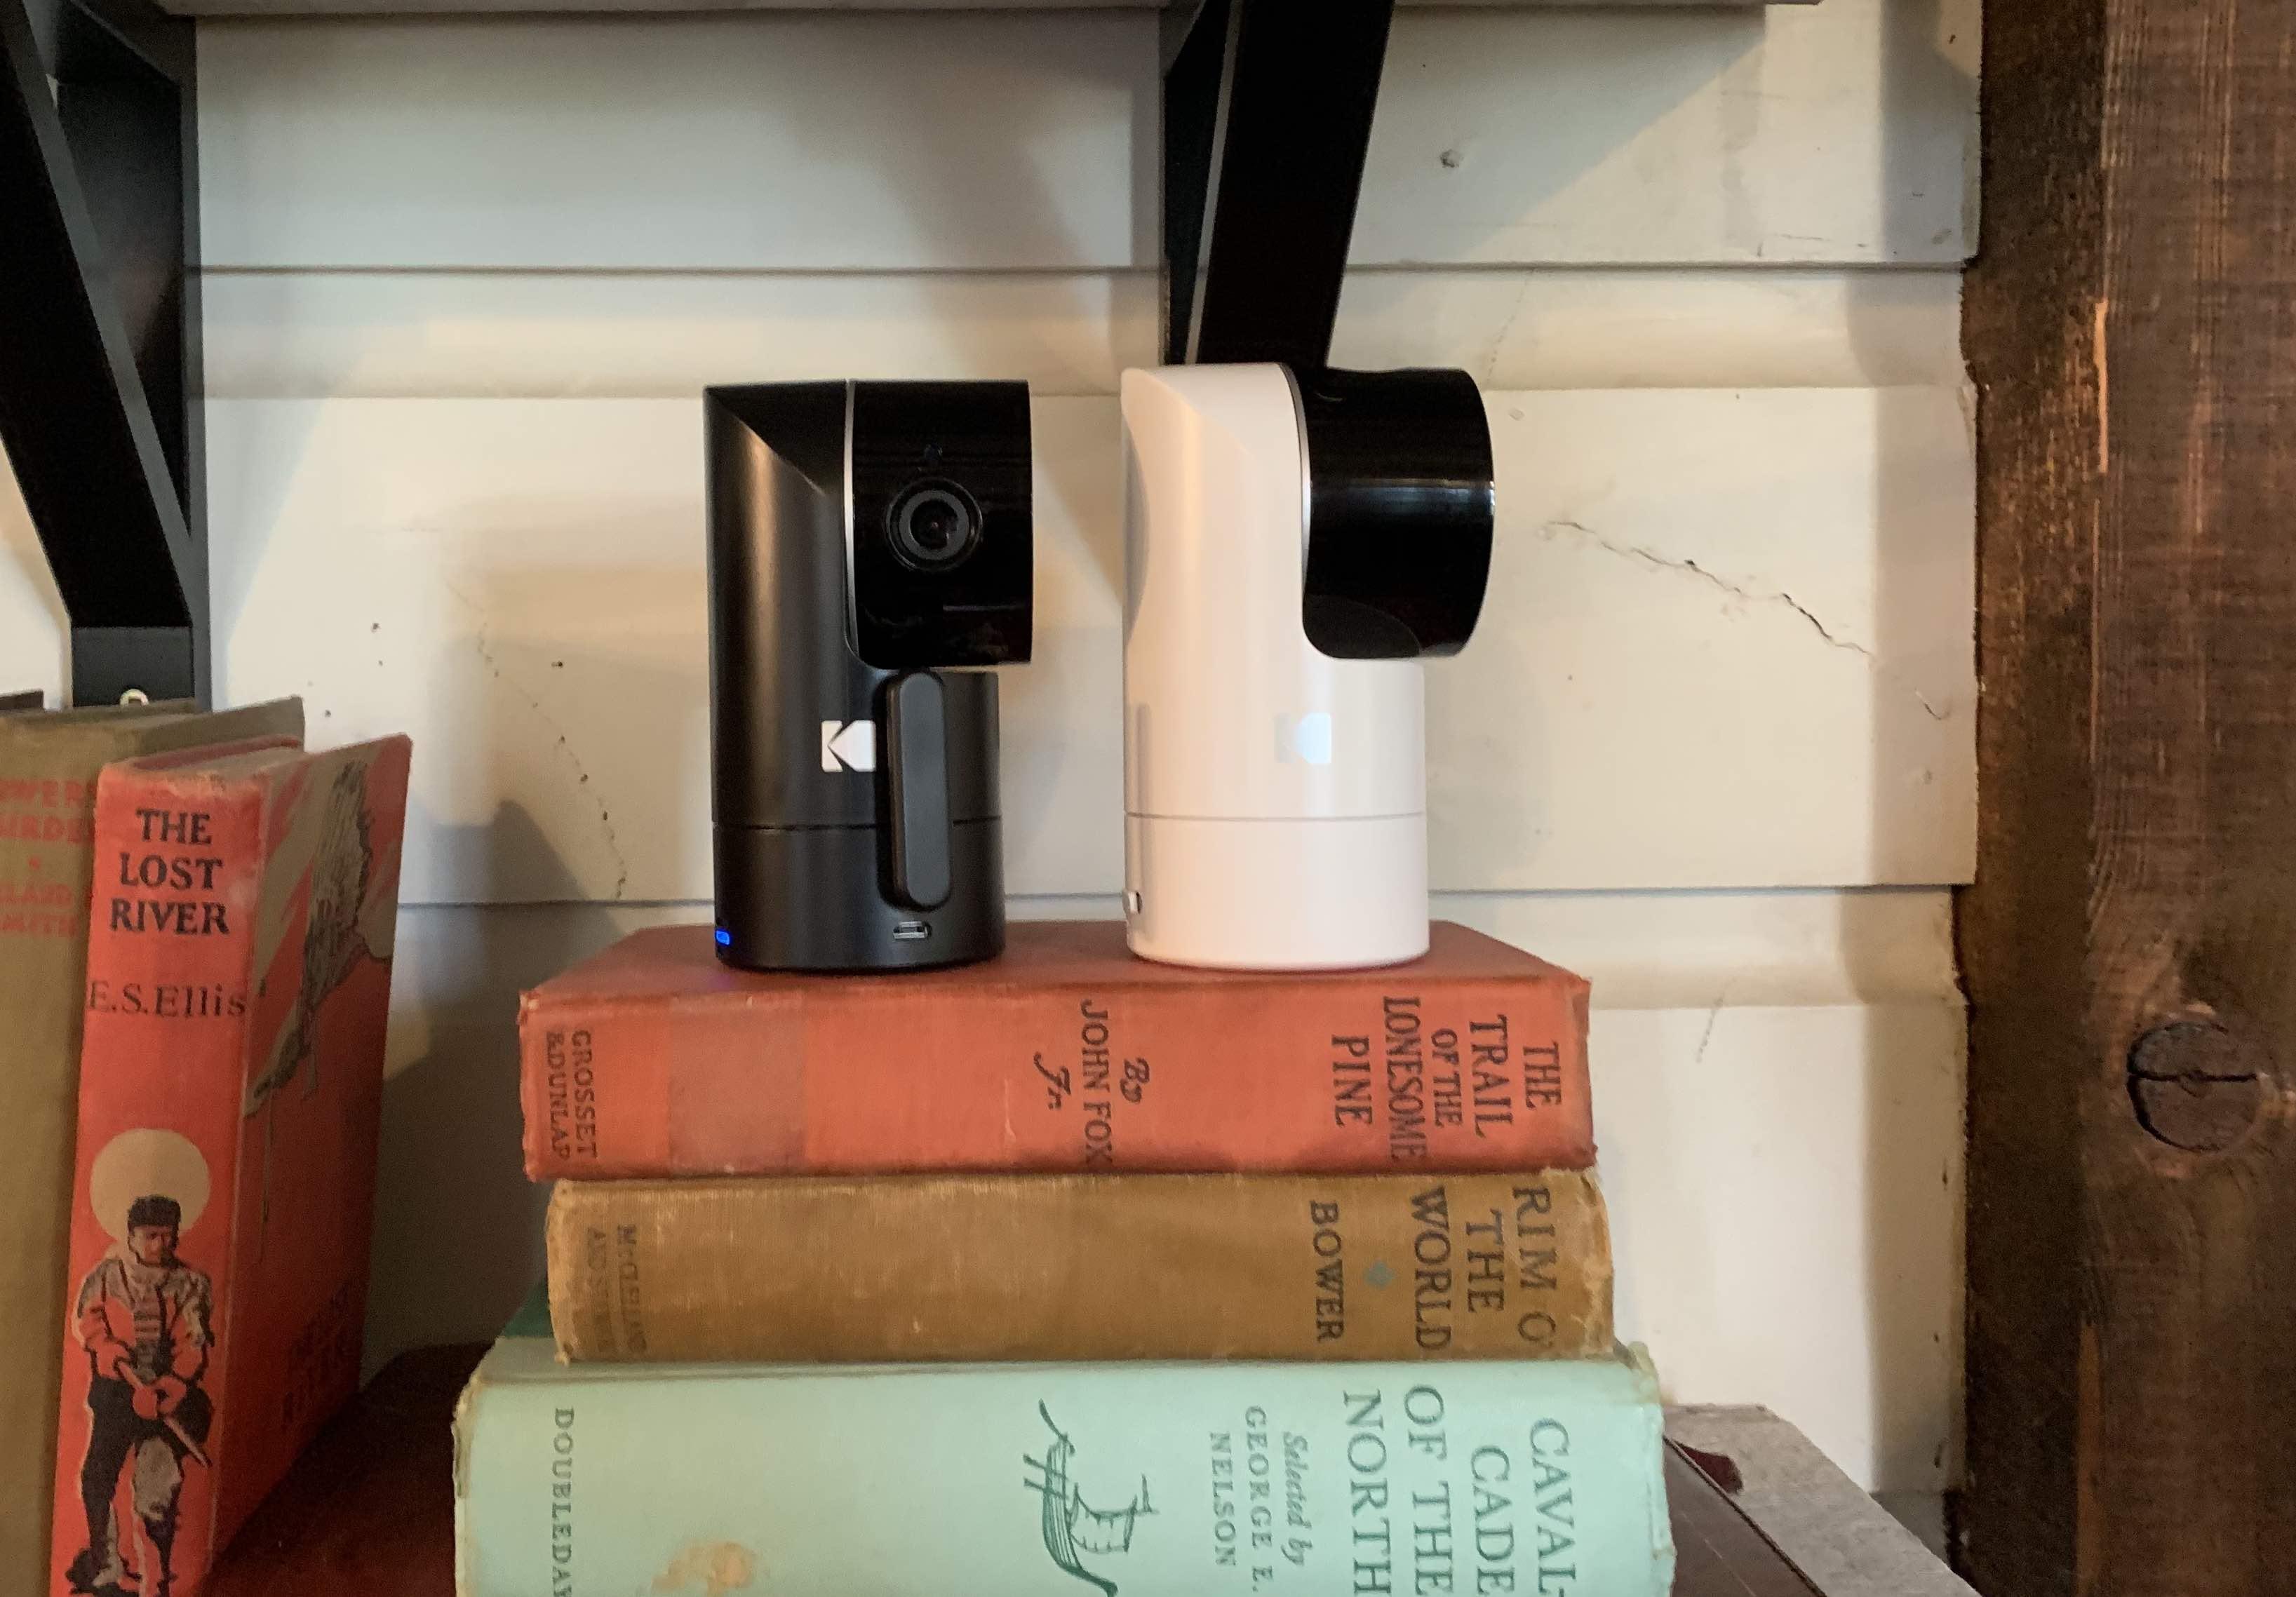 KODAK Cherish Home Security Camera and Baby Monitor Review